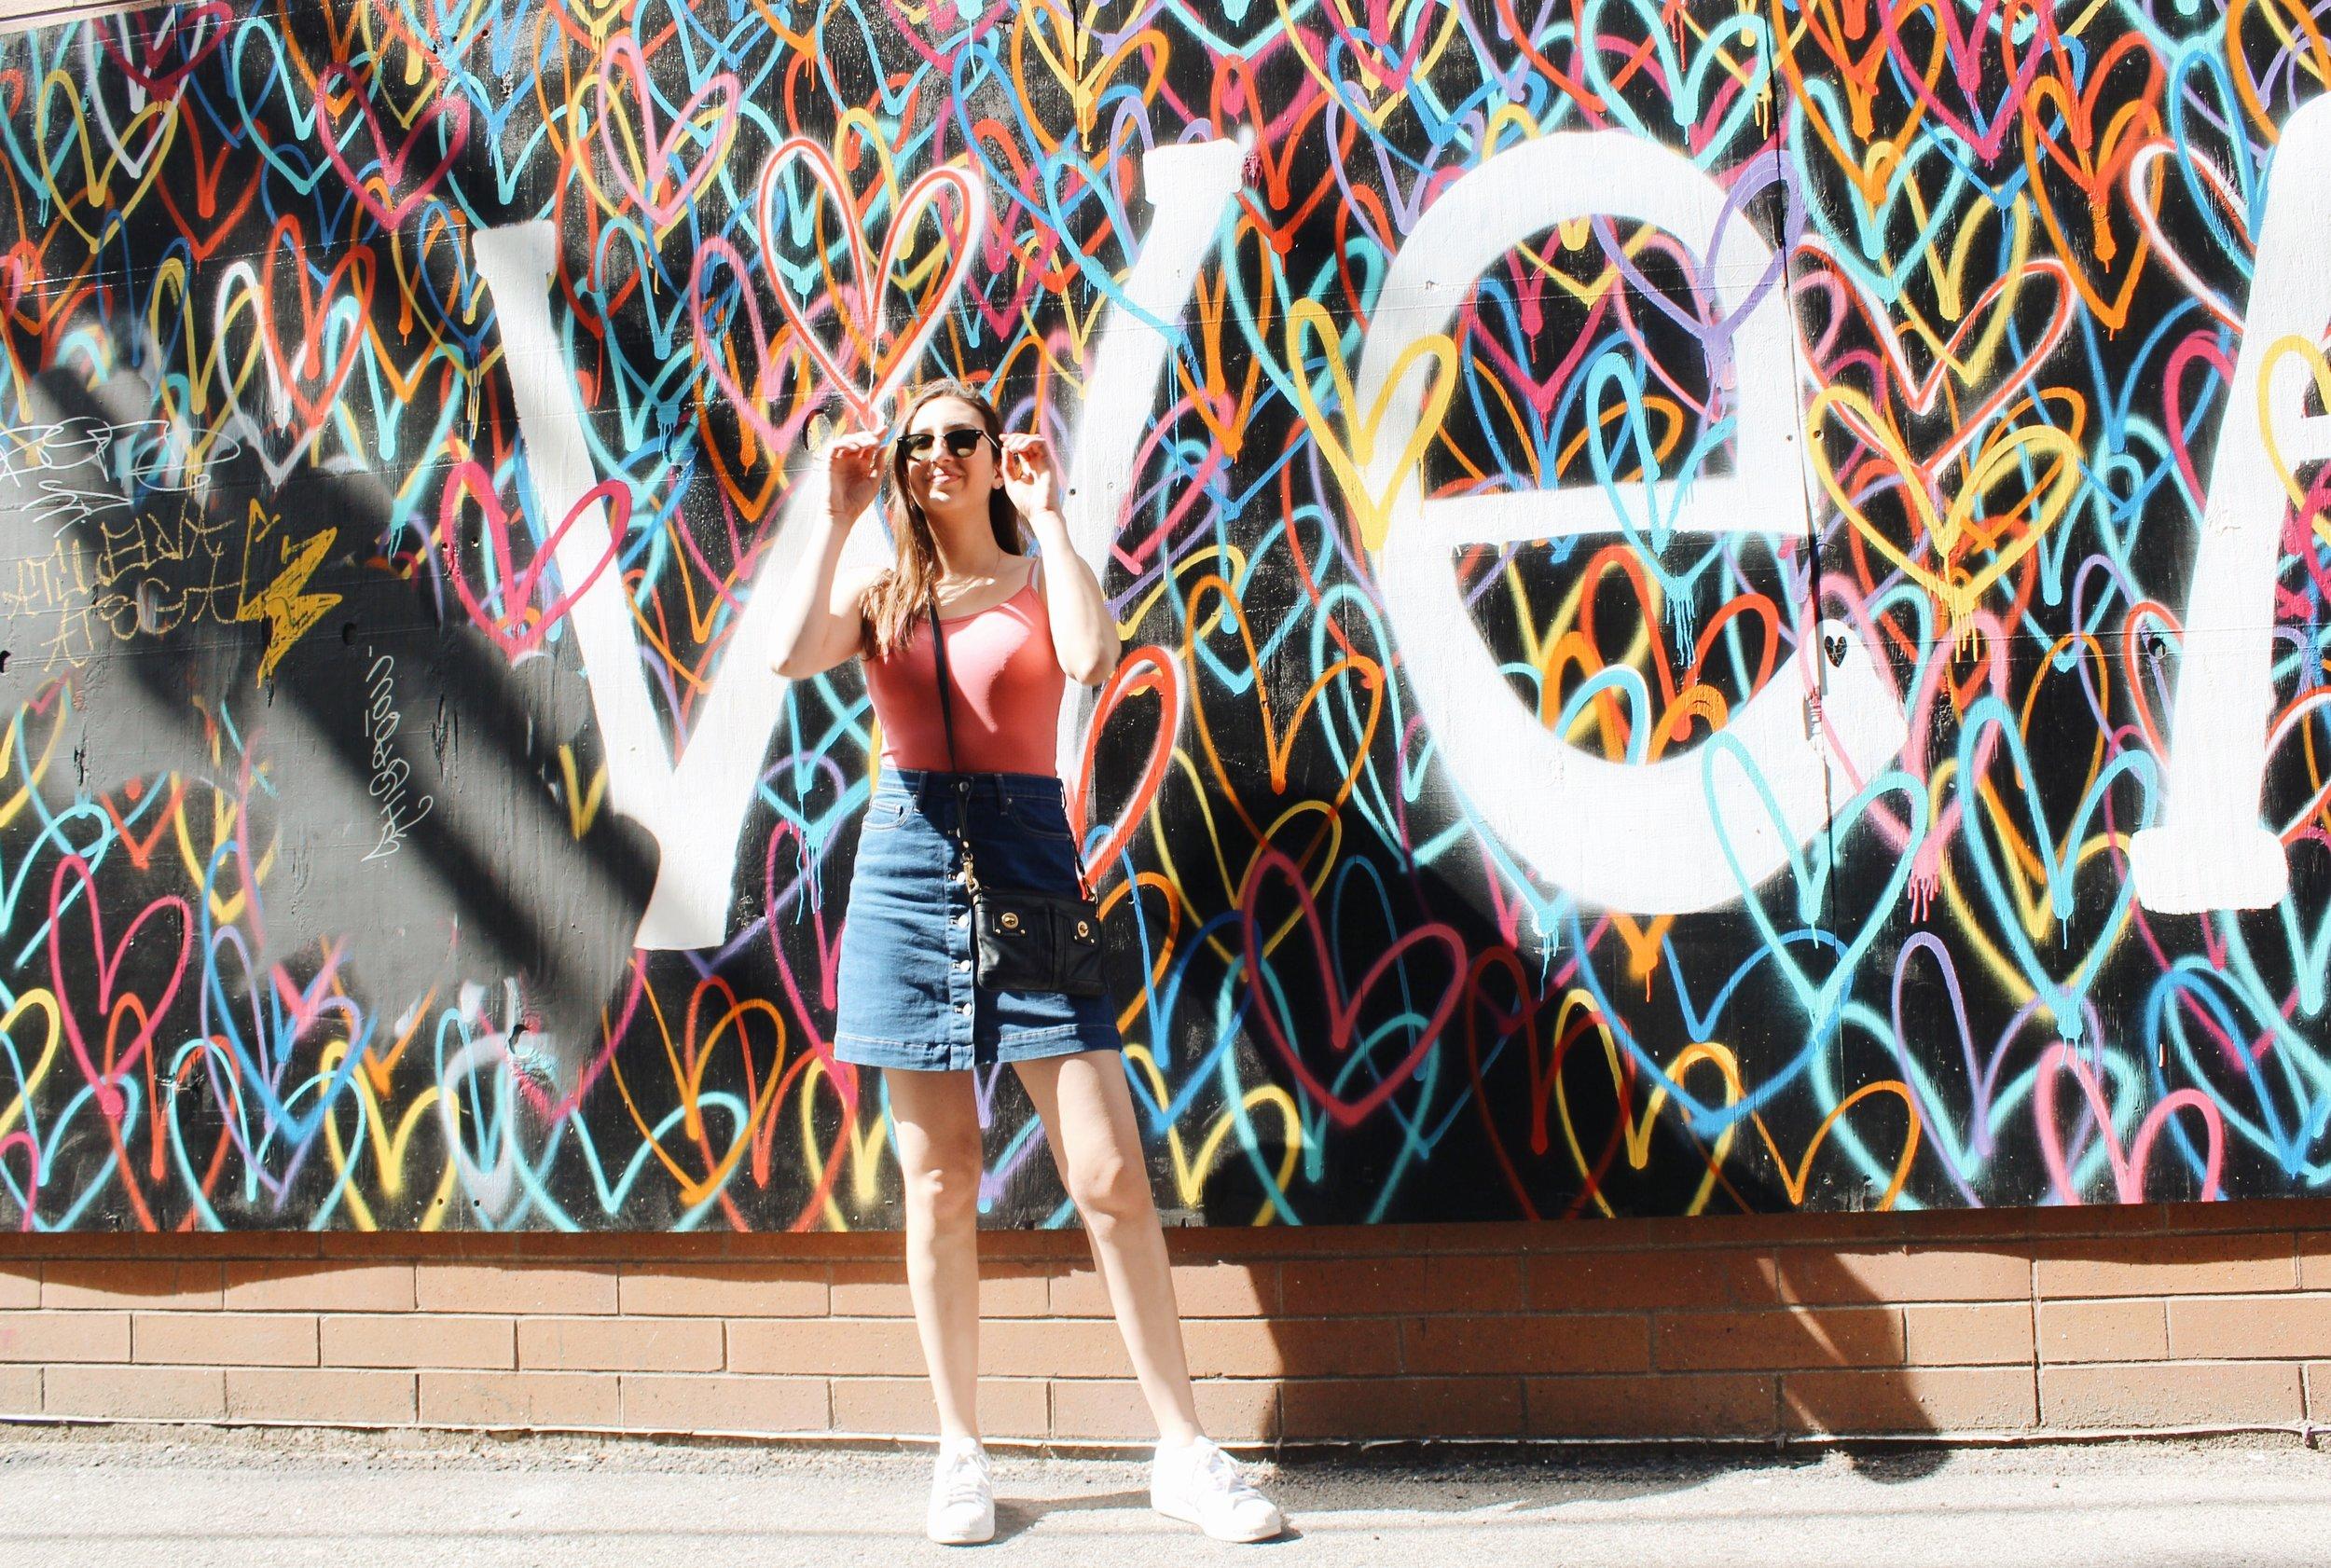 Amanda wears sunglasses,  R  ay-Ban ; tank top,  Urban Outfitters ; skirt,  Gap ; sneakers,  Adidas .